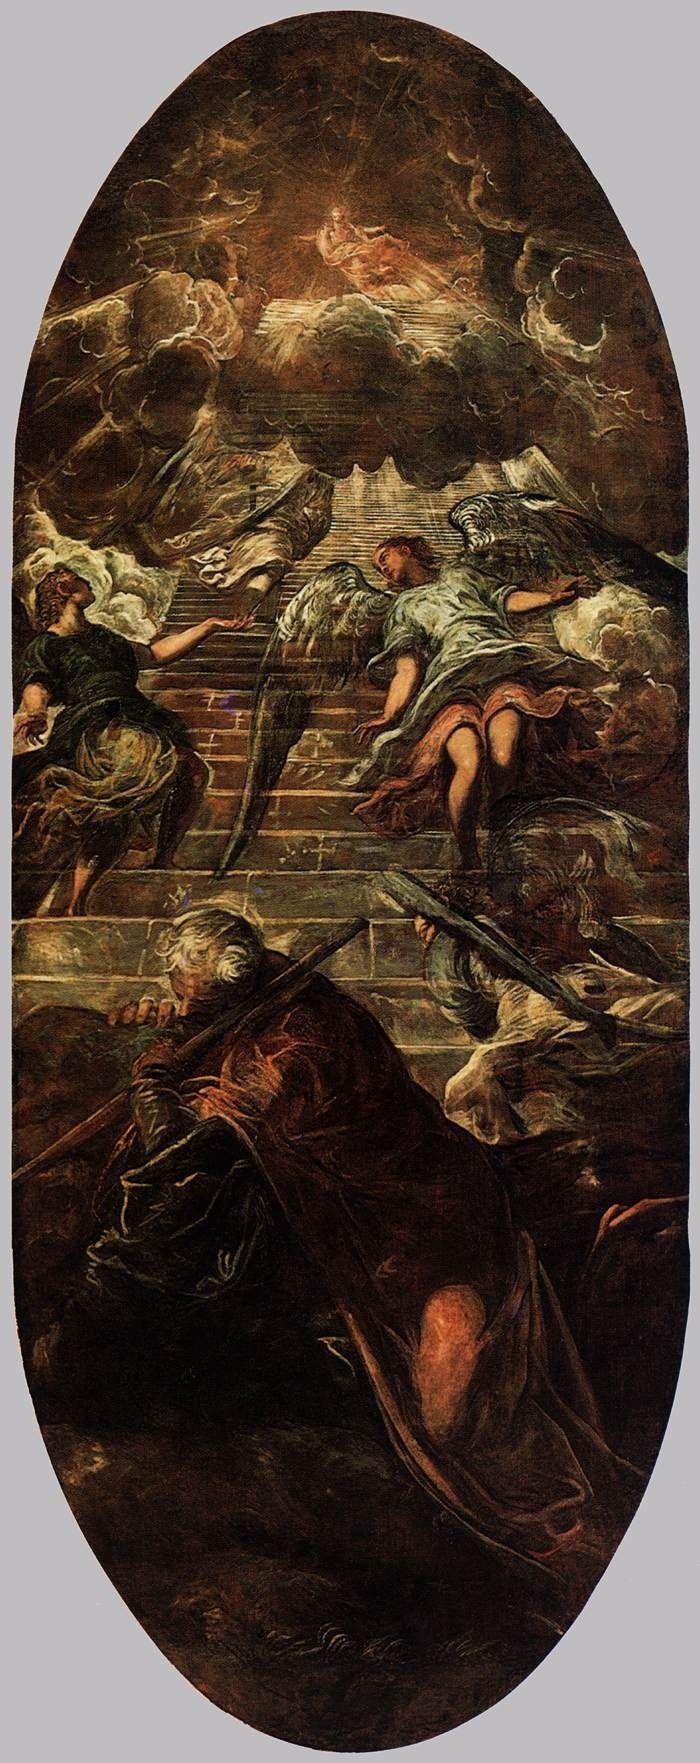 TINTORETTO, Jacob's Ladder, 1577-78, Oil on canvas, 660 x 265 cm, Scuola Grande di San Rocco, Venice. La escalera de Jacob por Tintoretto, óleo de la década de 1570.